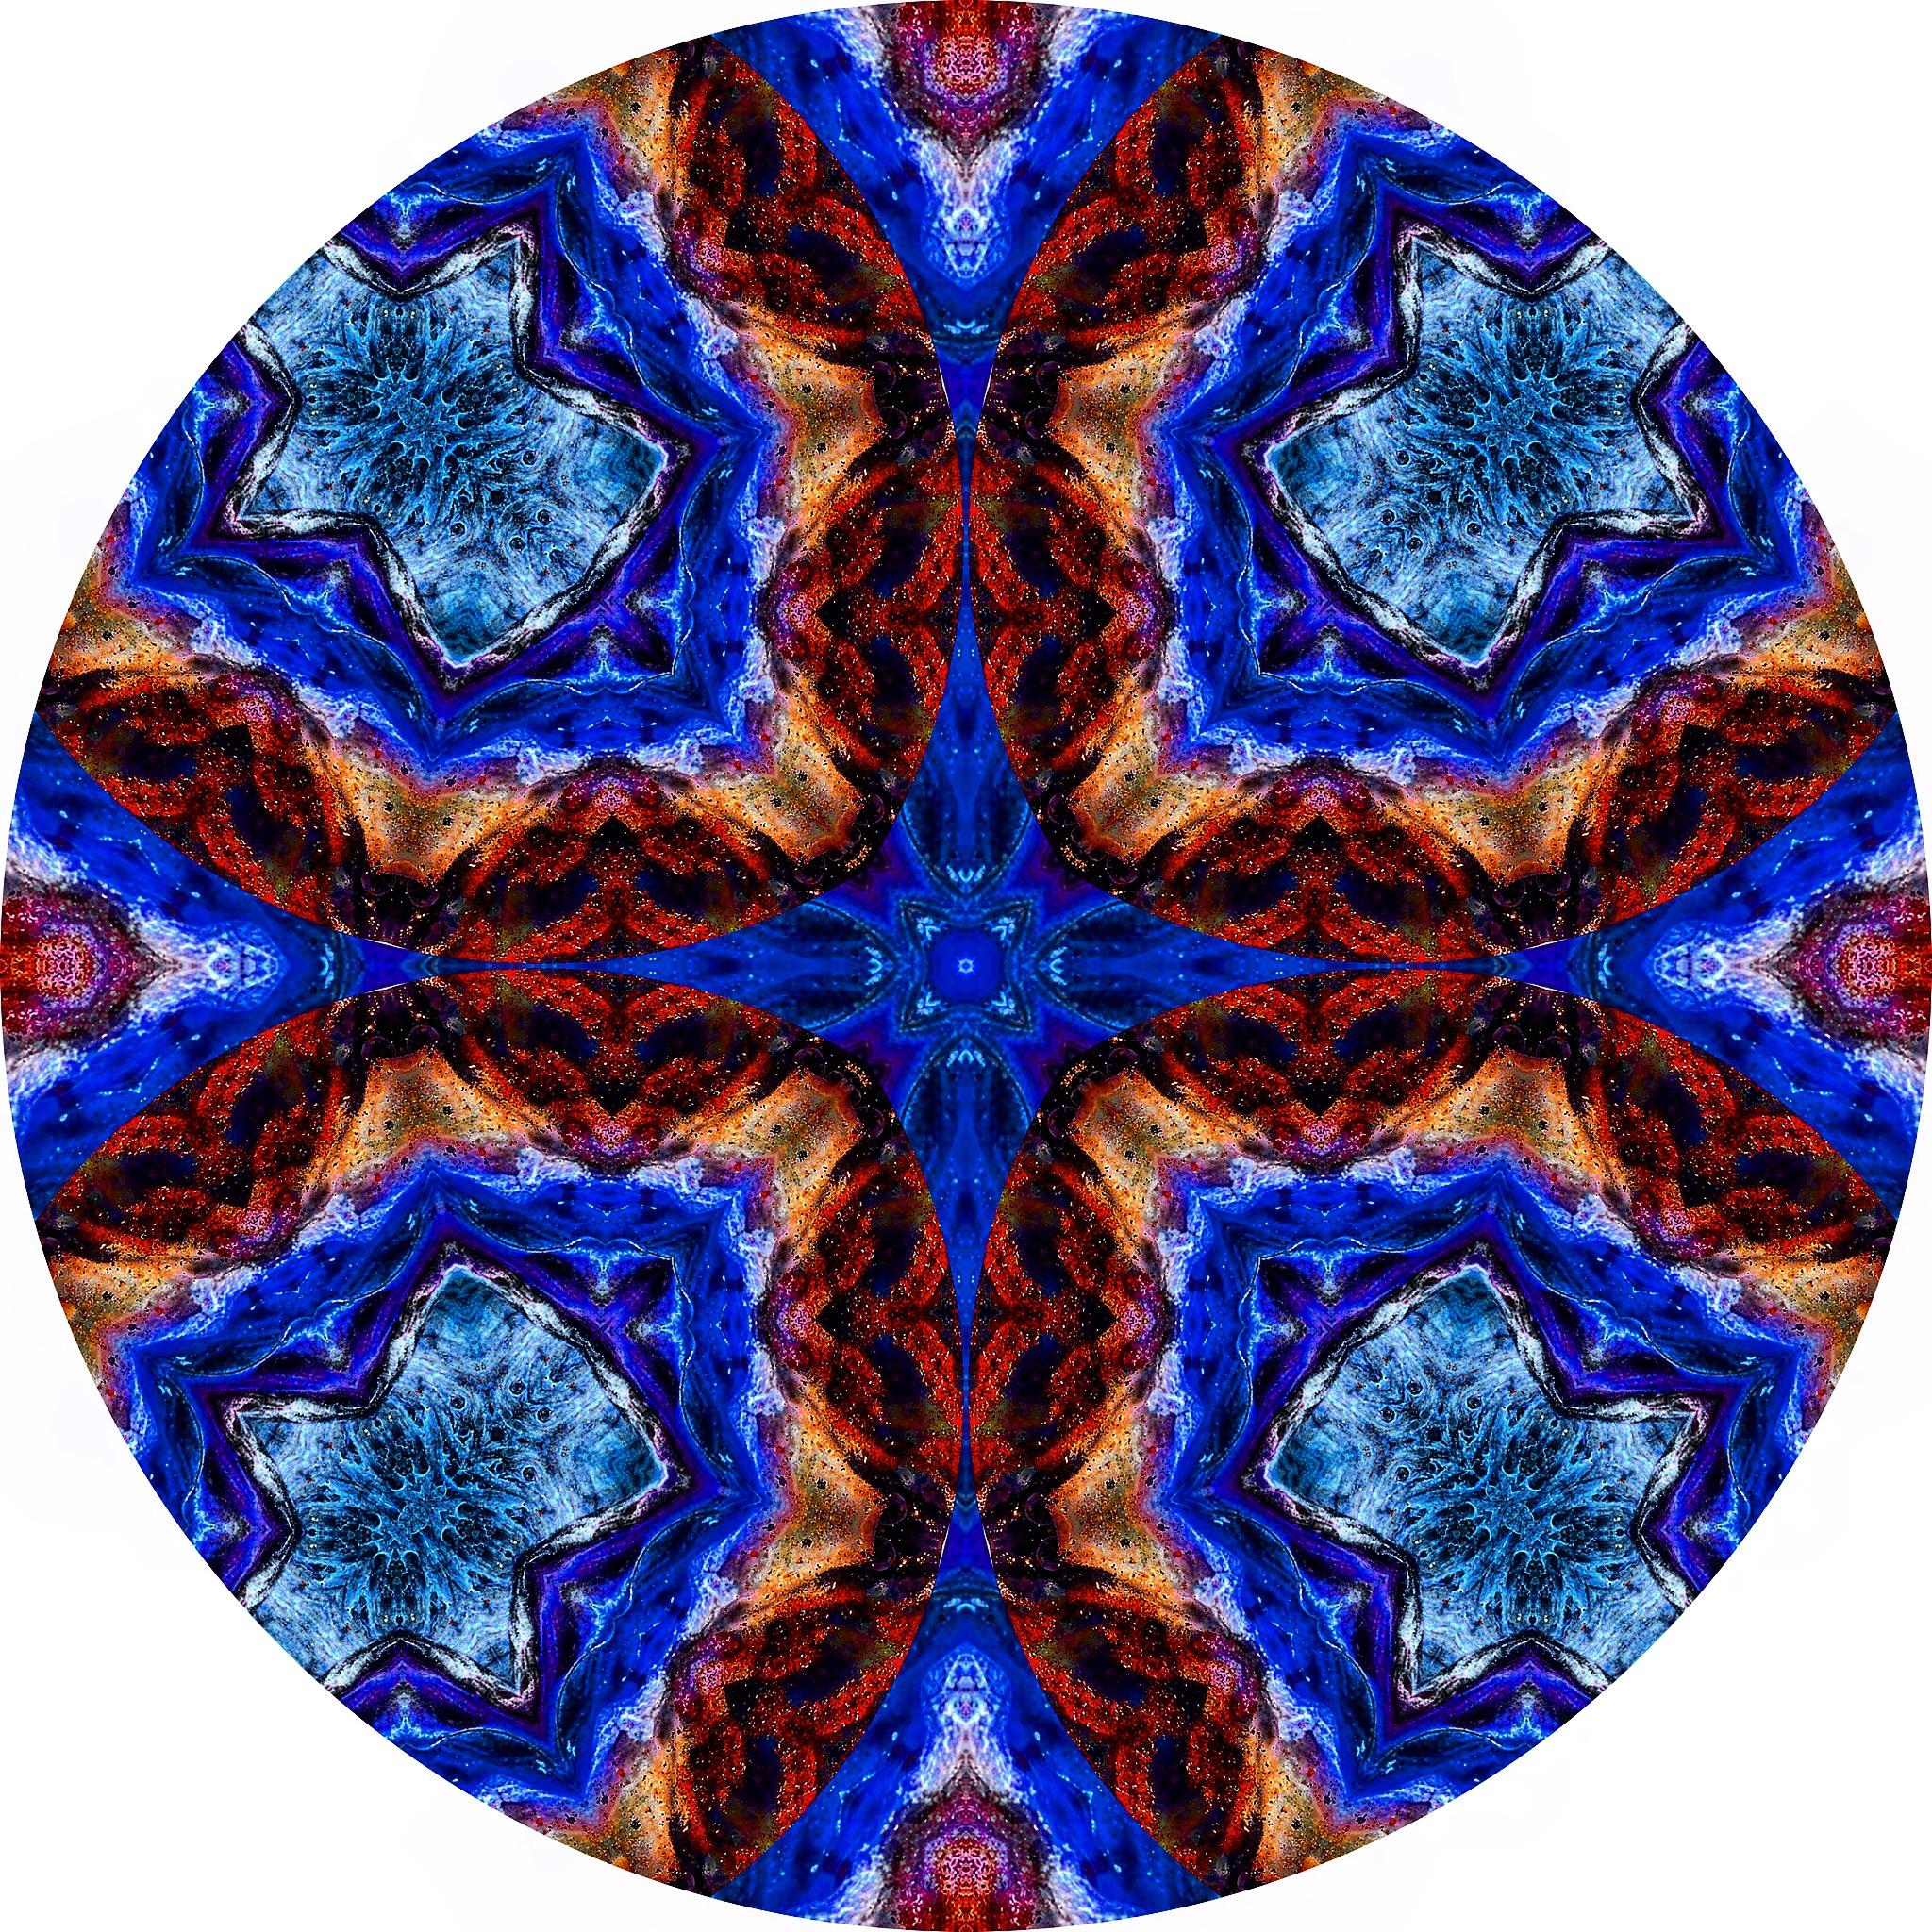 File Coral #A 8.JPG